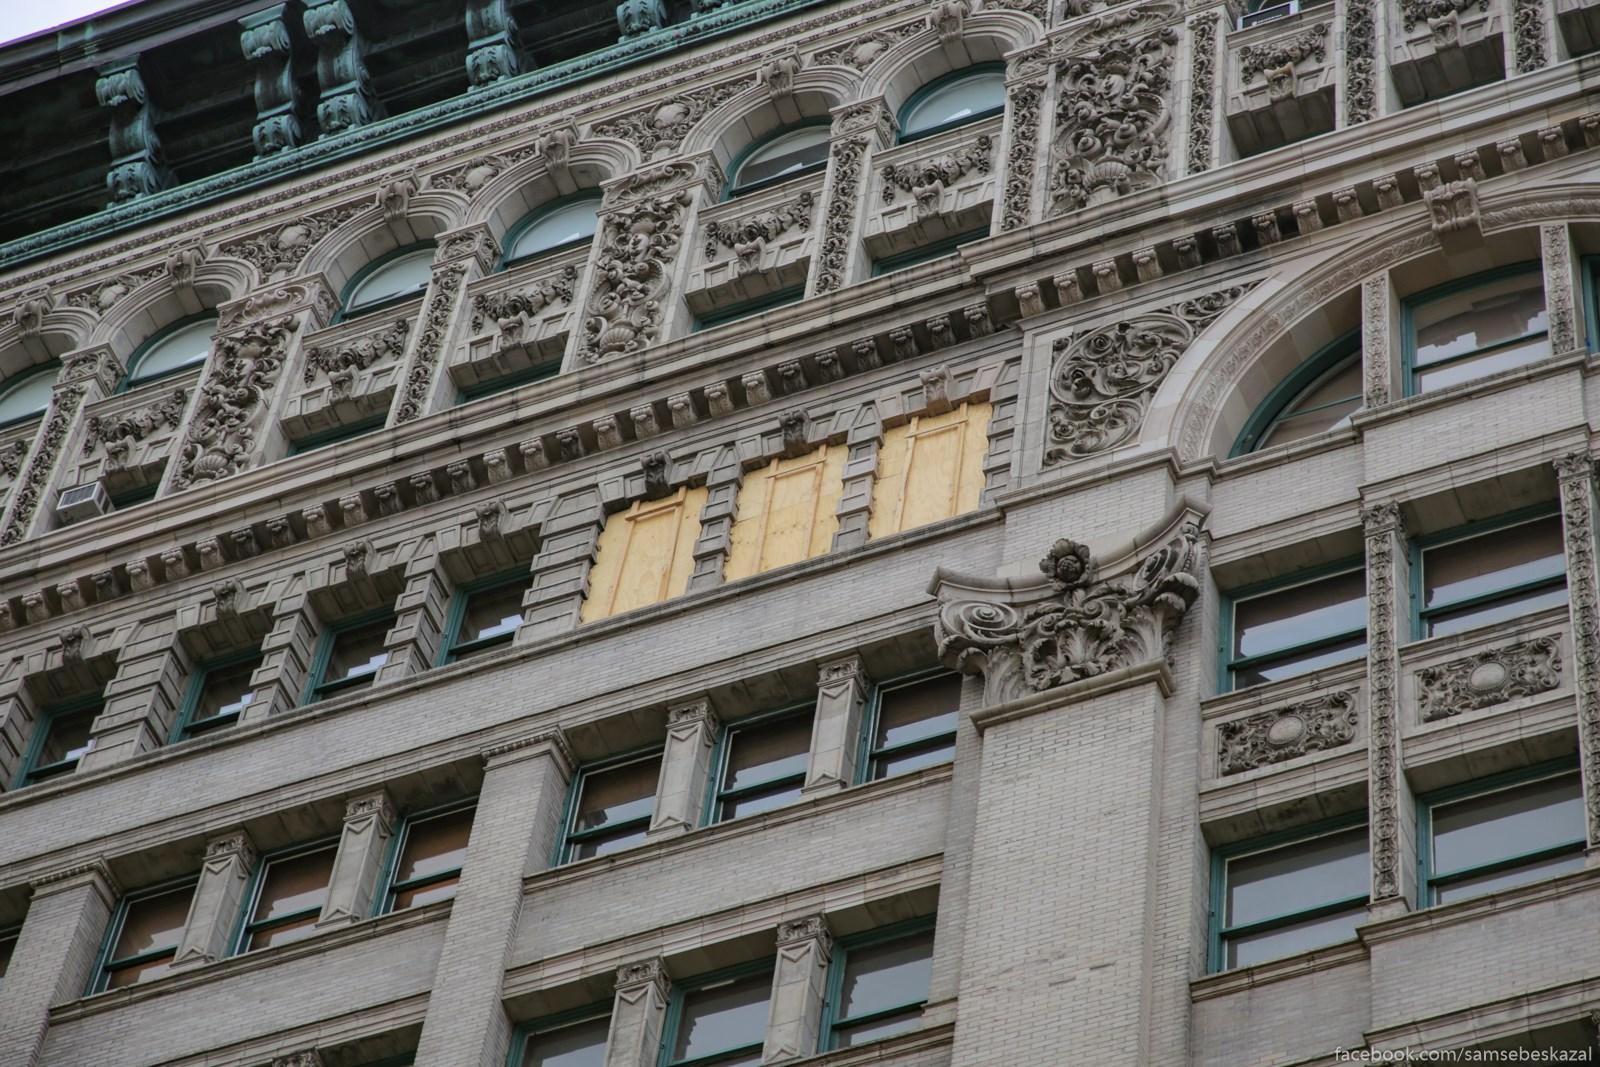 Kto-to zakolotil okna na...